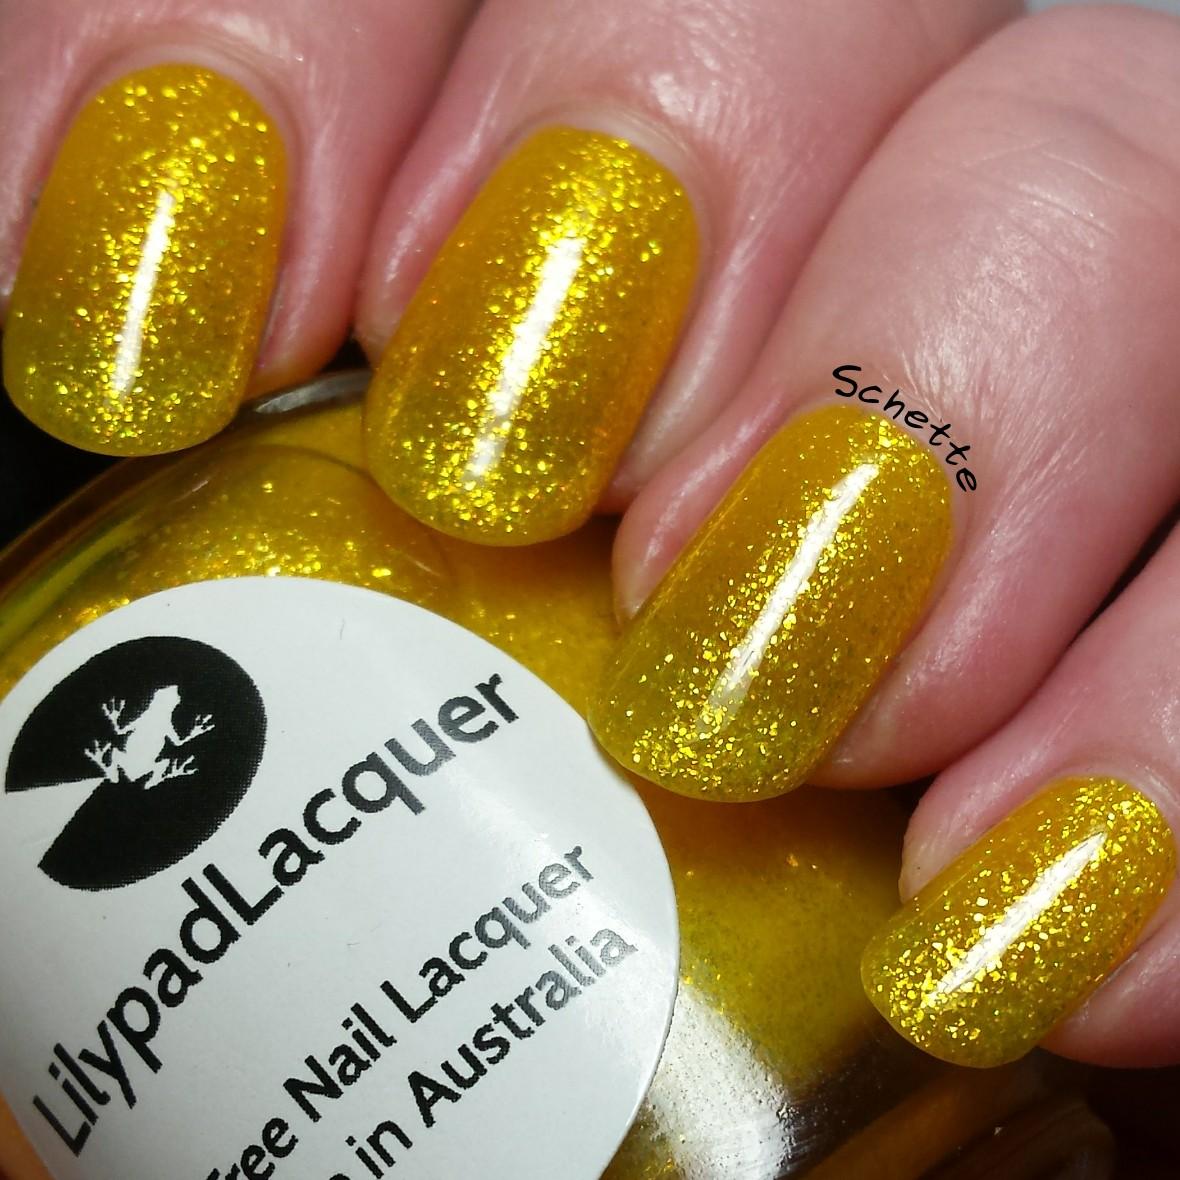 Lilypad Lacquer : Yellow diamonds